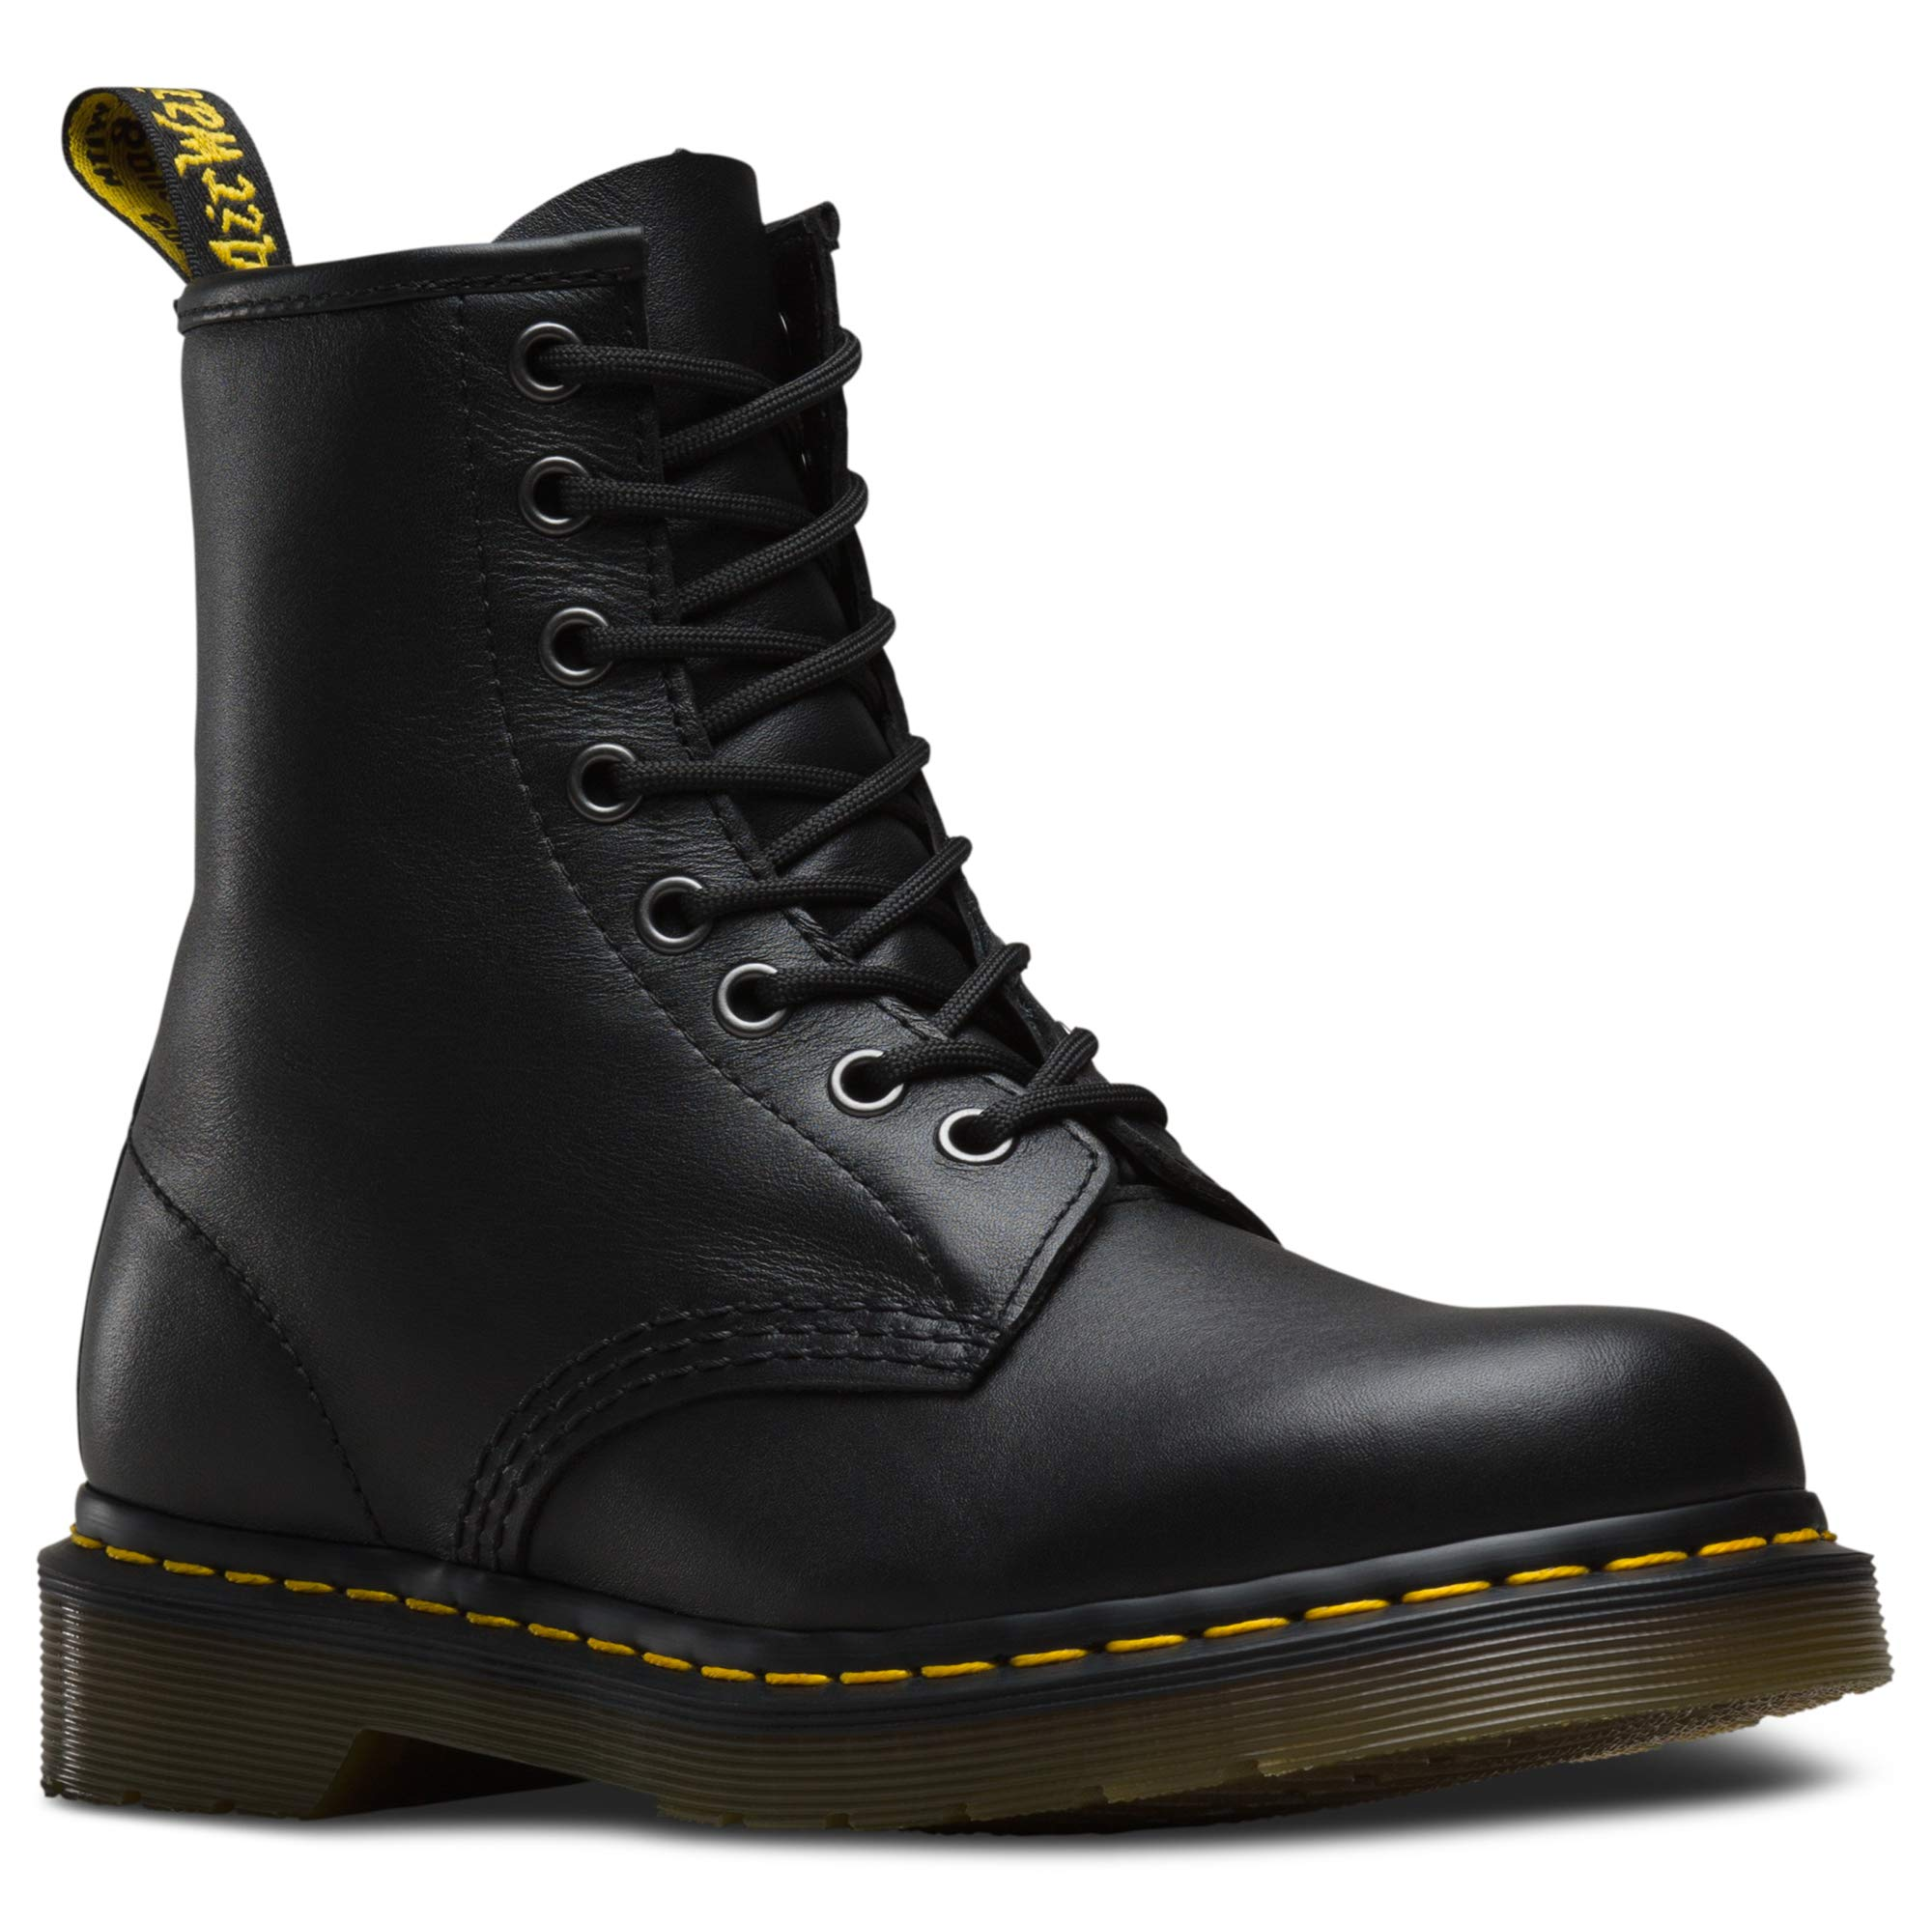 Dr. Martens mens 1460 8 Eye Boot,Black Nappa,13 UK/14 M US by Dr. Martens